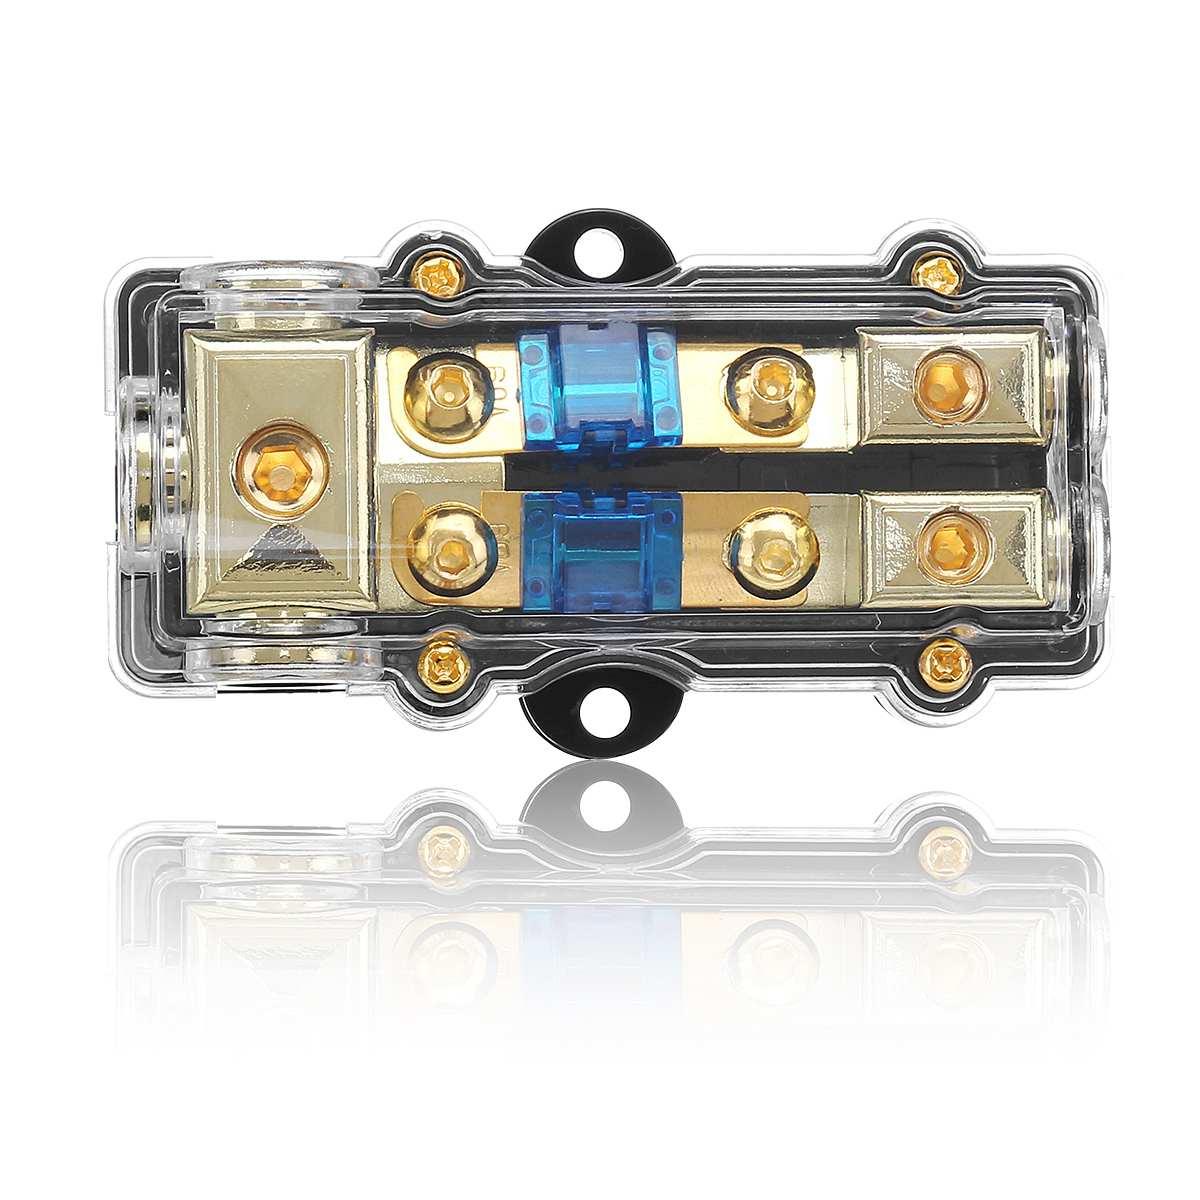 12v 100a plastic car audio fuse holder box 1 in 2 ways out. Black Bedroom Furniture Sets. Home Design Ideas